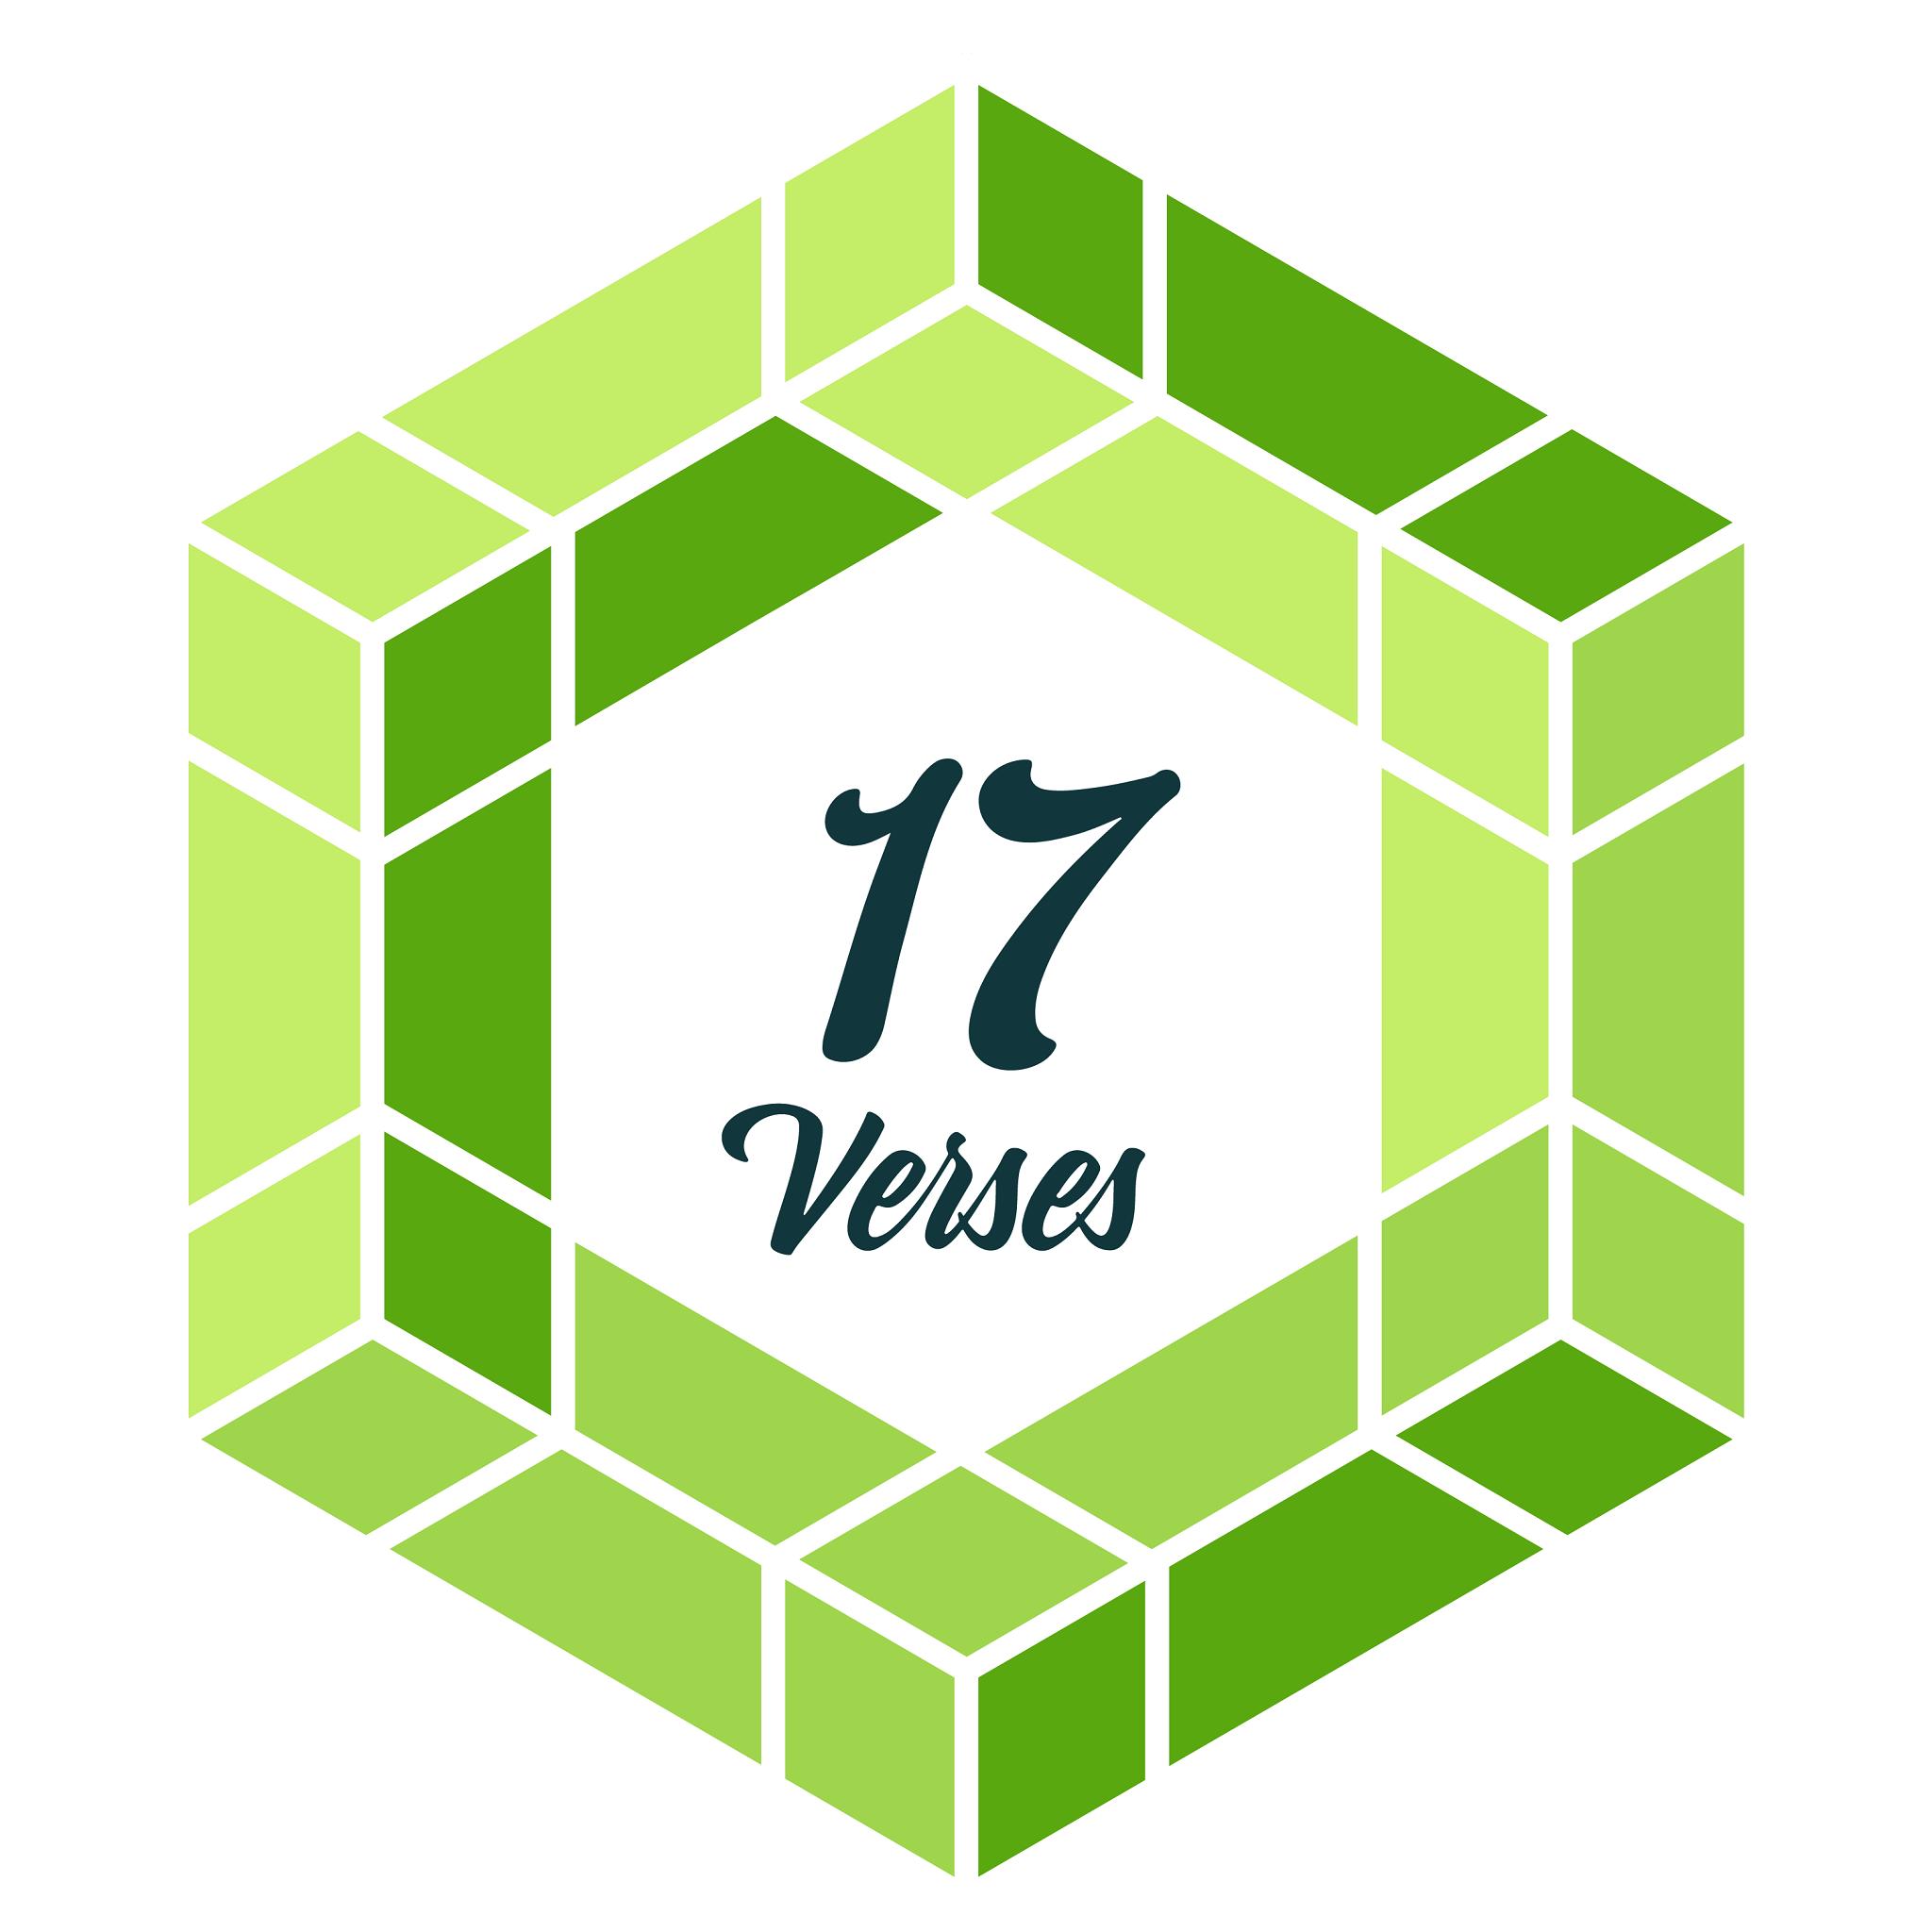 Year 2 - Surah 24 (An-Nûr), Verses 58-64